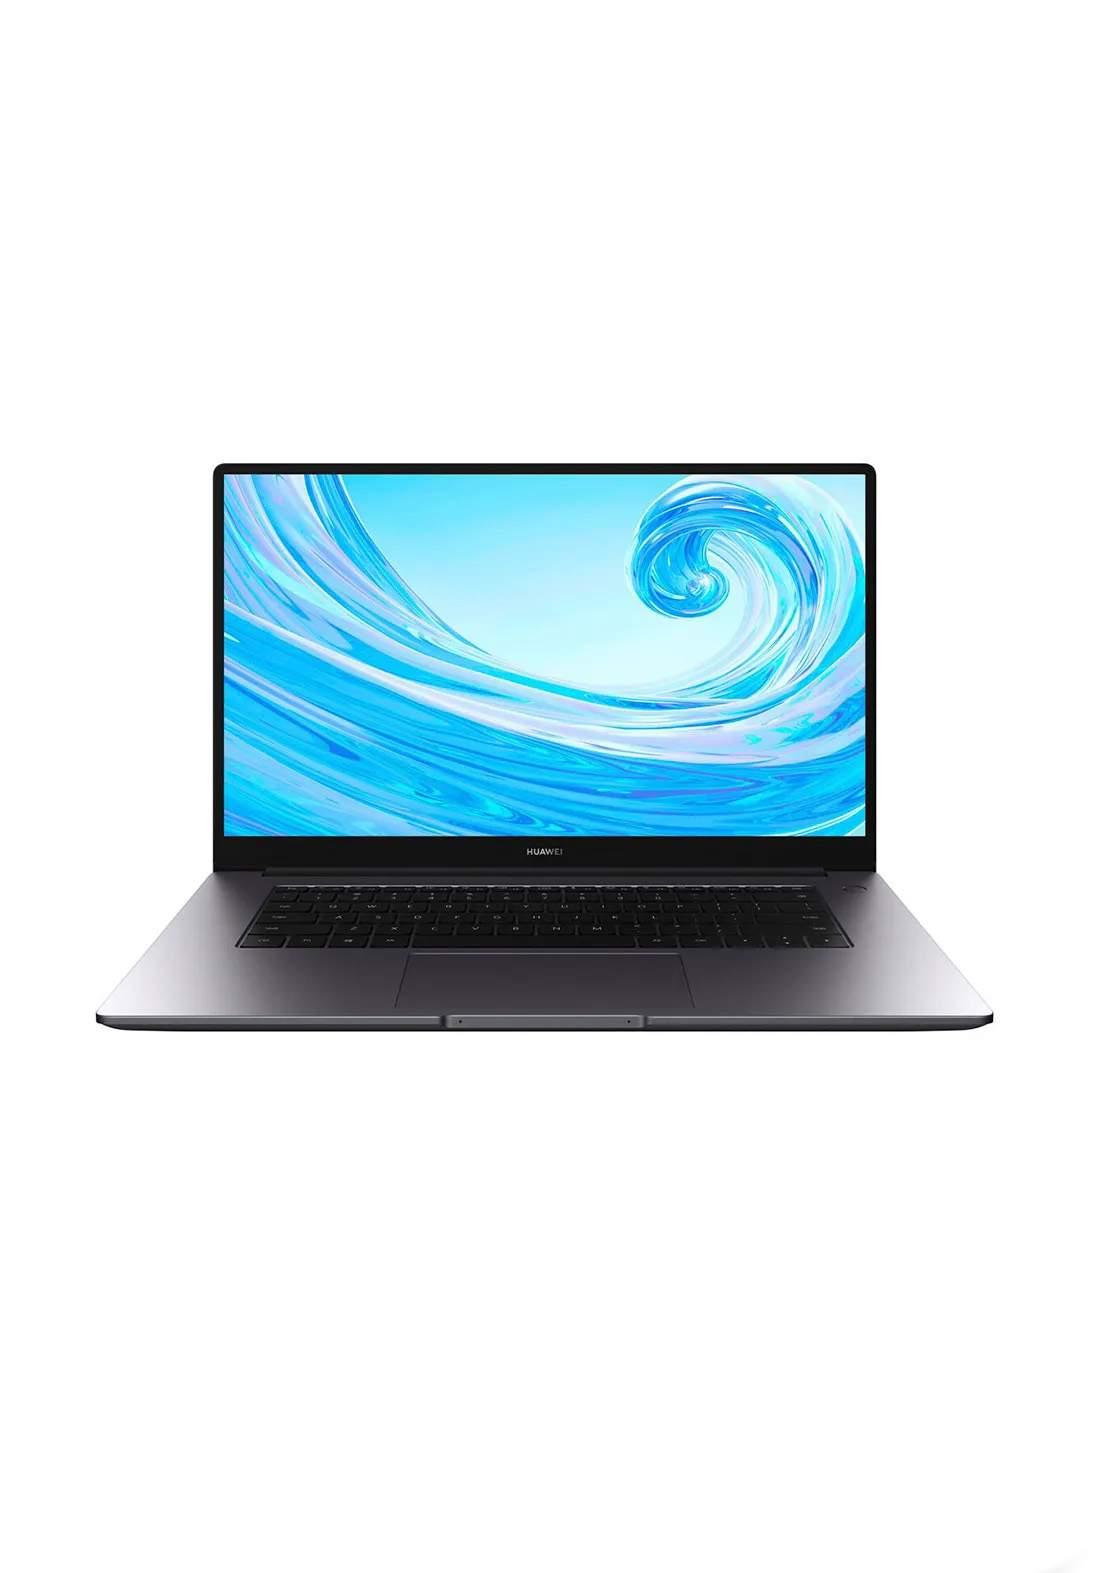 Huawei MateBook D15 - Ryzen 7-3700U - 8 GB RAM - 512 GB SSD - Silver